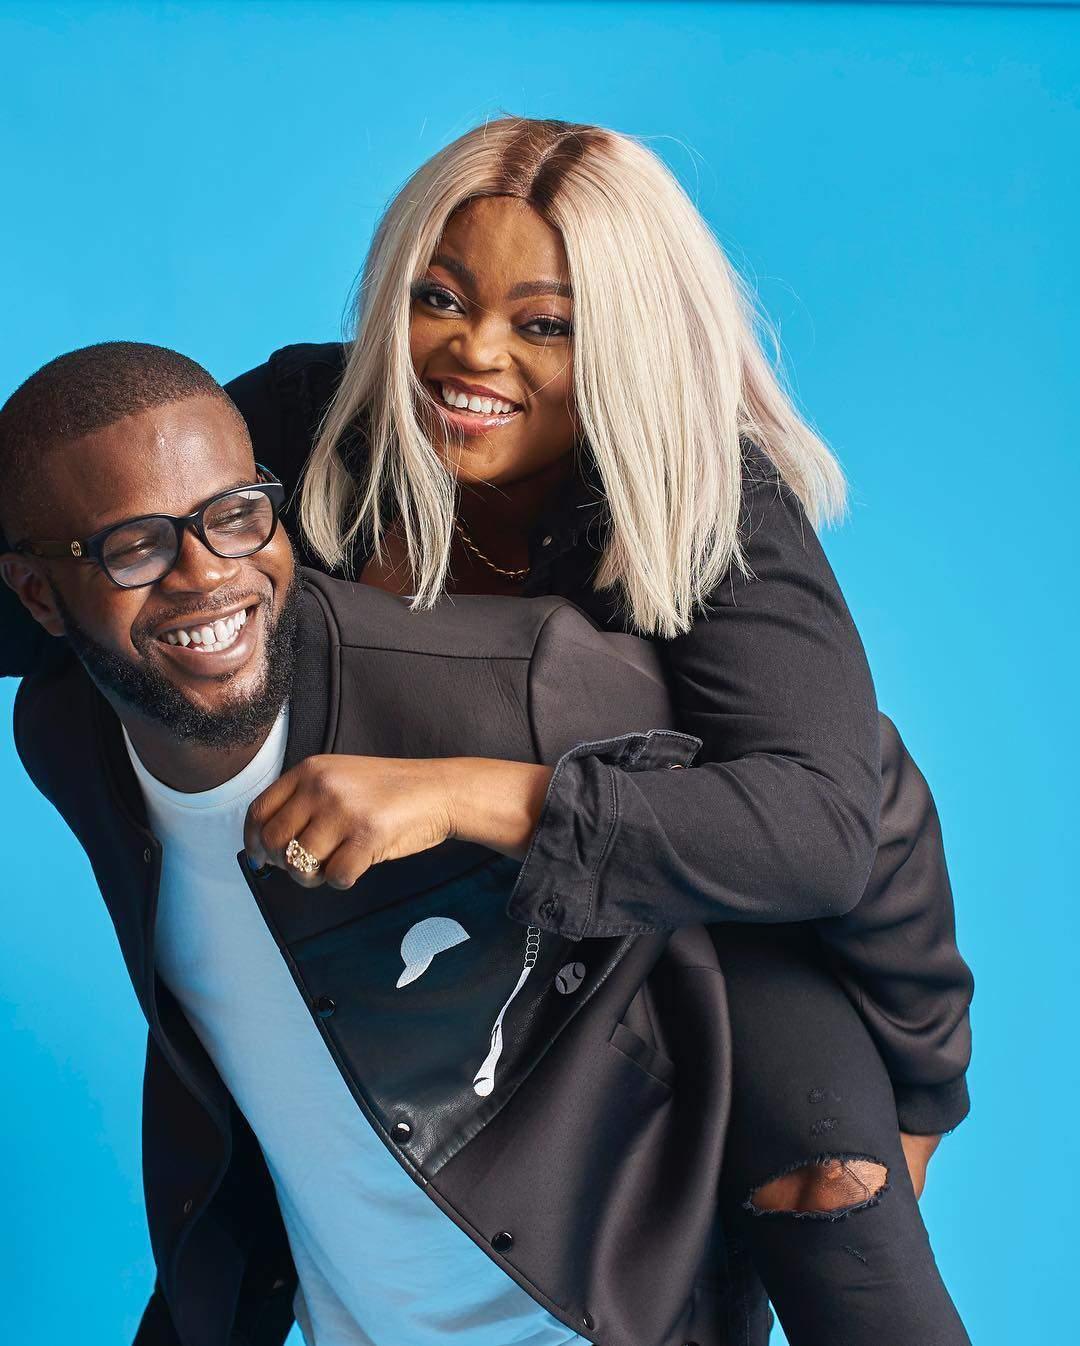 JJC Skillz And Funke Akindele Are Too Cute For Words In Birthday Shoot 1